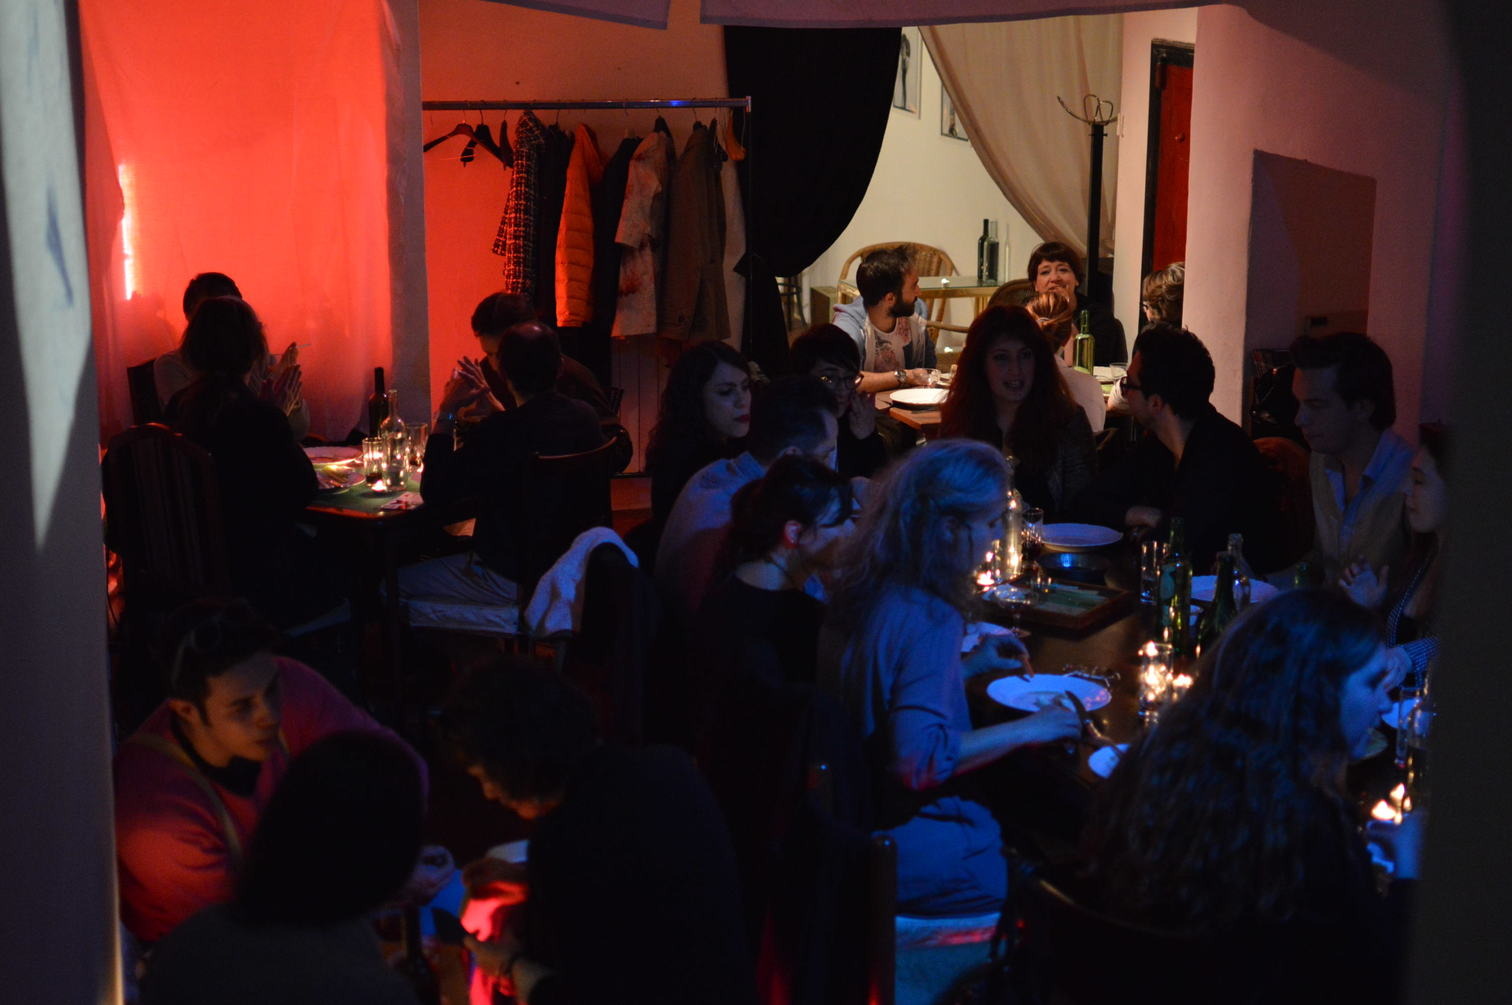 IlGattaRossa - 15 Apr 2015 - I Mangiatori Di Teste - 04_DSC_0346